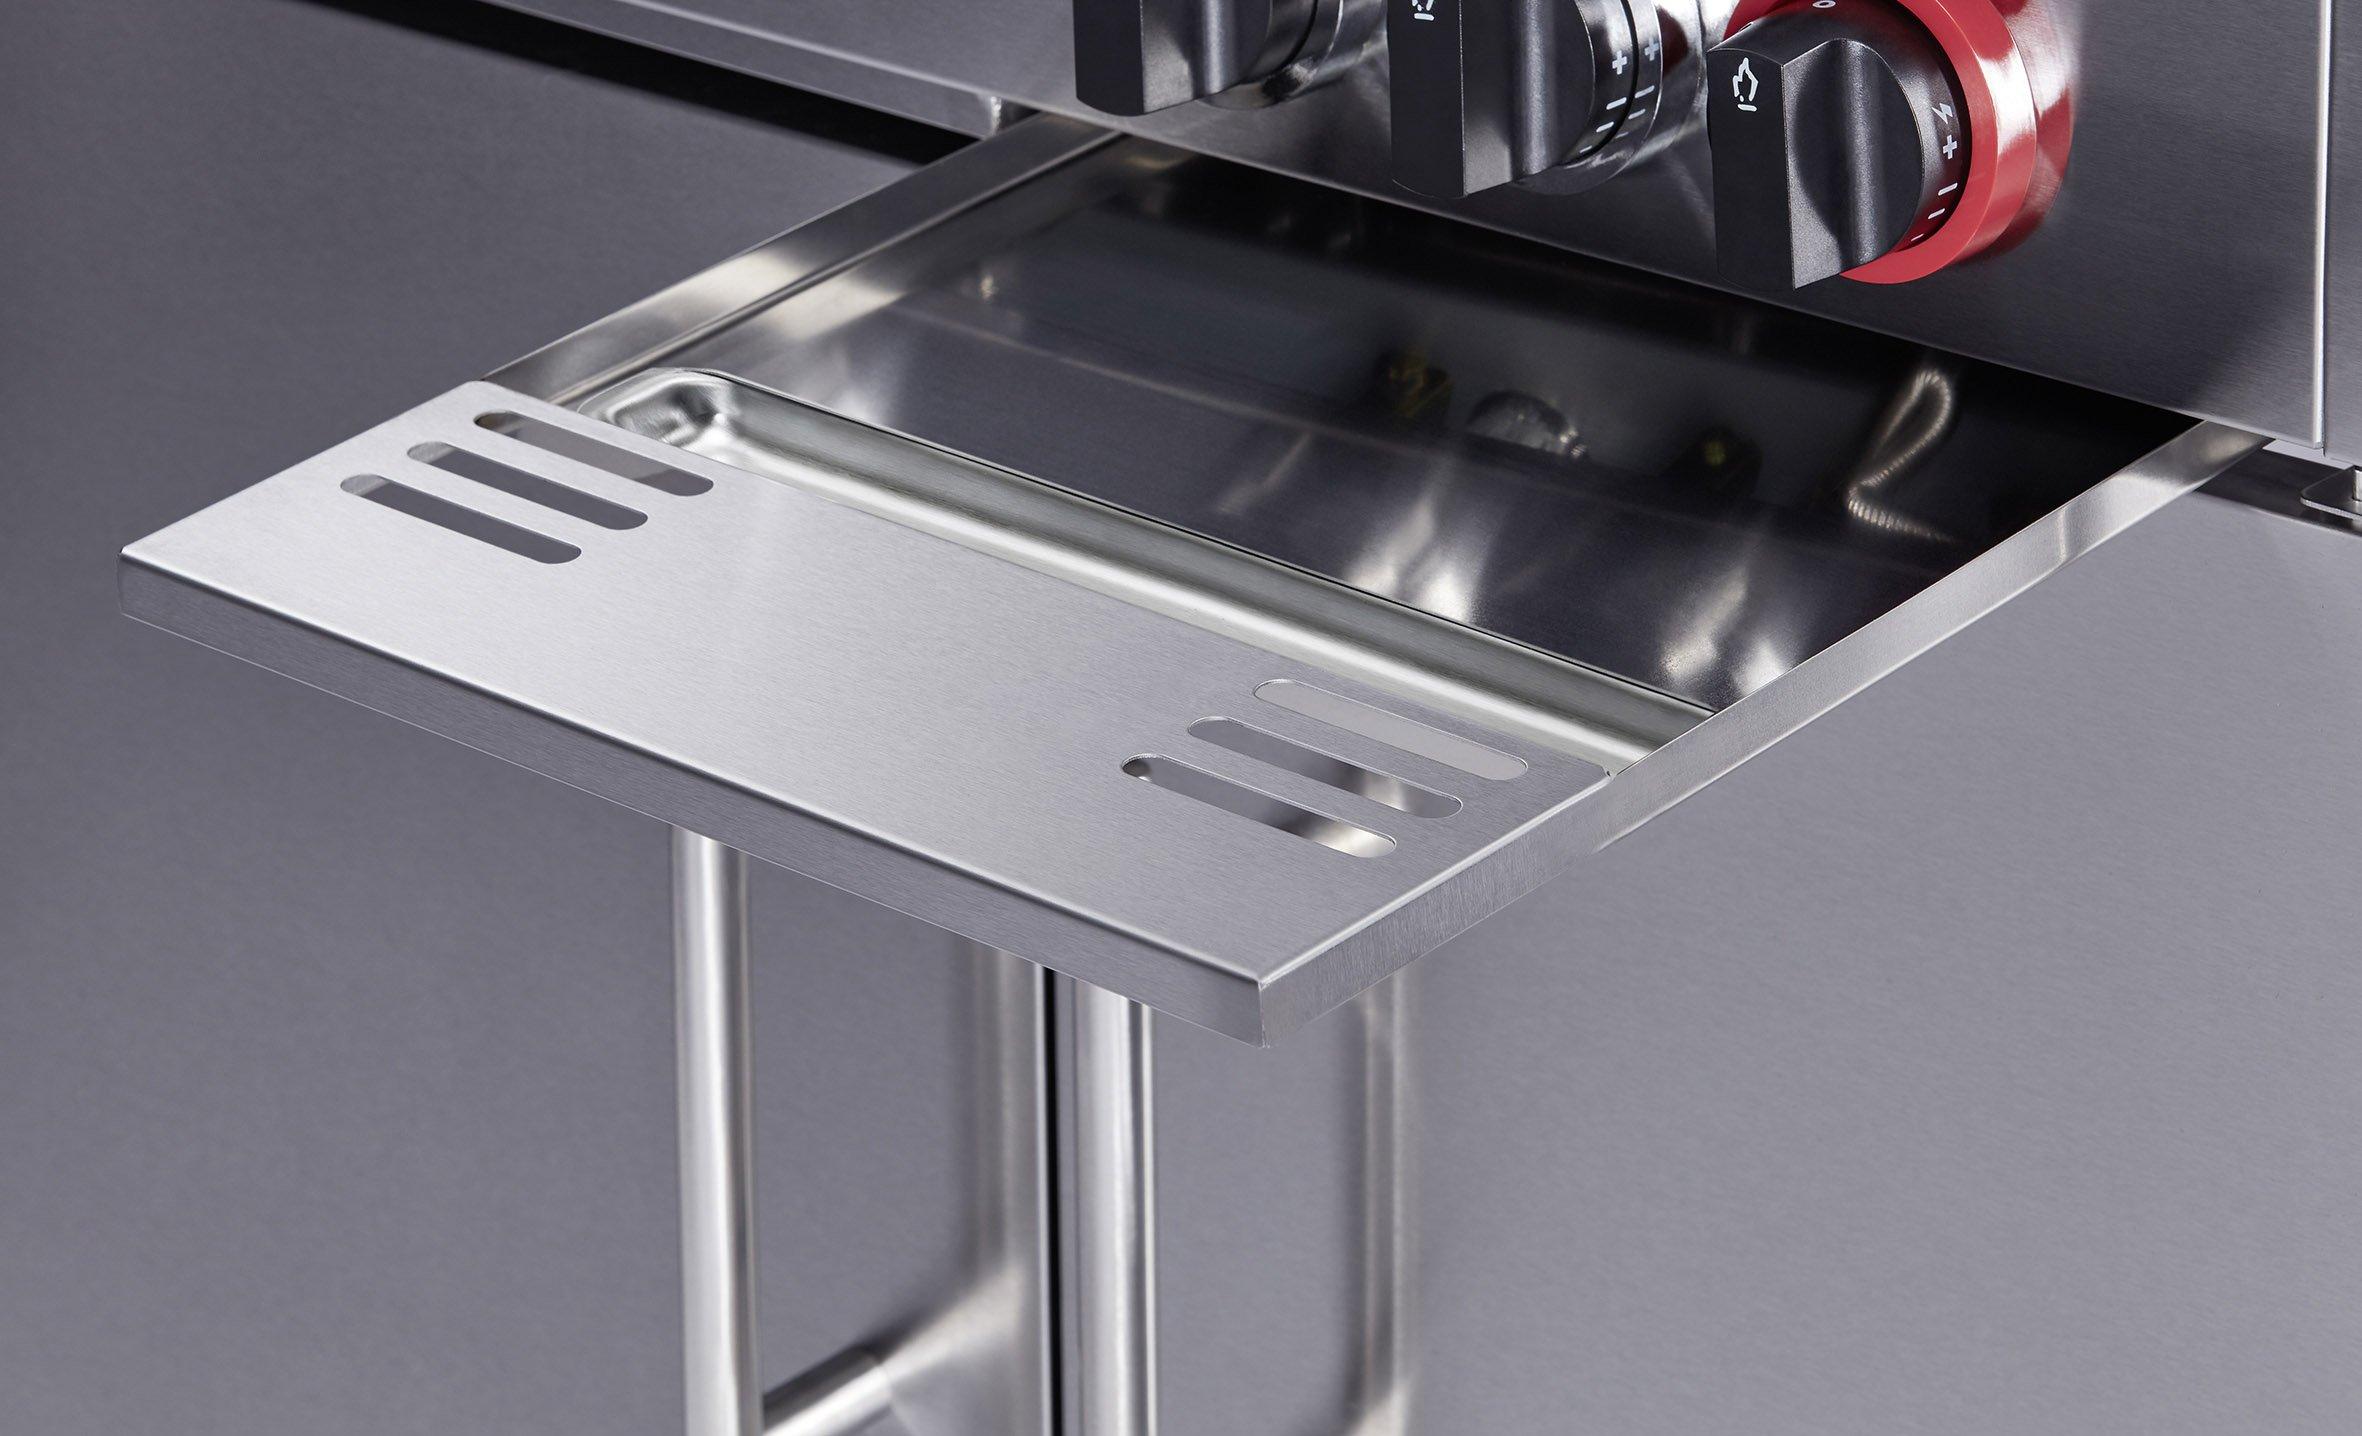 Outdoor Küche Kansas 4 Sik : Enders kansas pro sik profi turbo bbq gasgrill infrarot